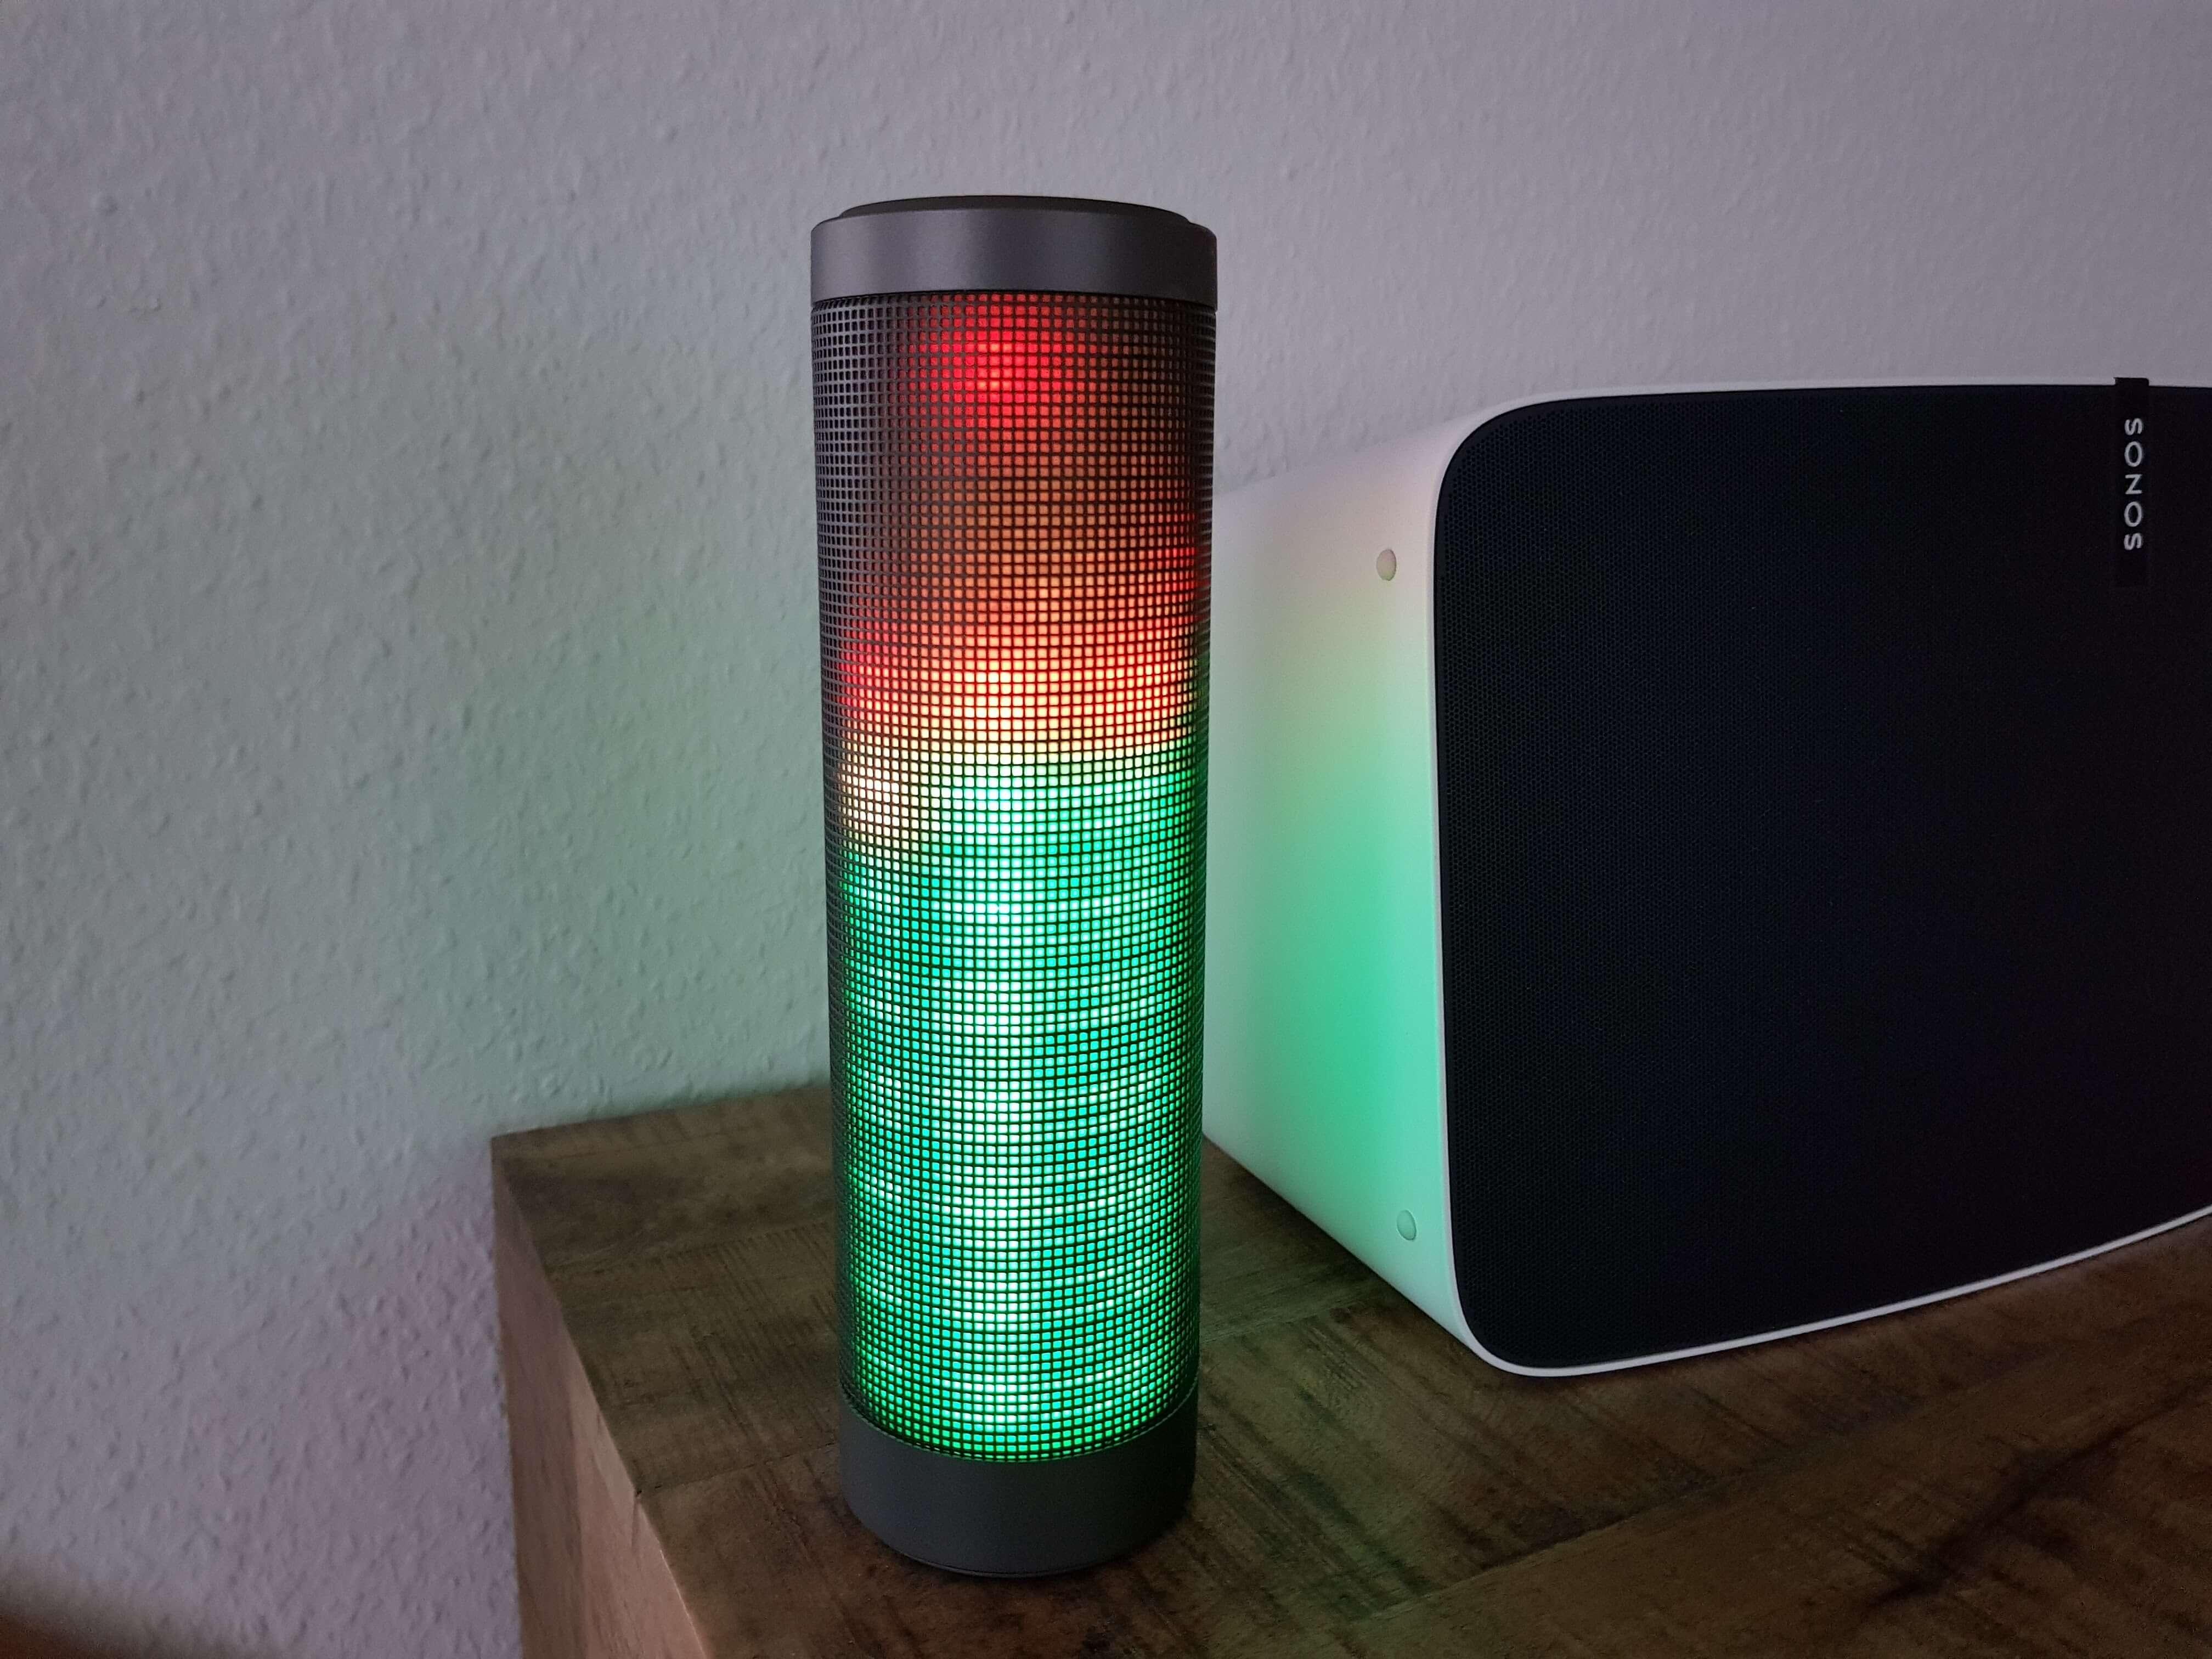 Blinkt viel, klingt gut: Bluetooth Lautsprecher Elegiant HIPHOP im Test 5